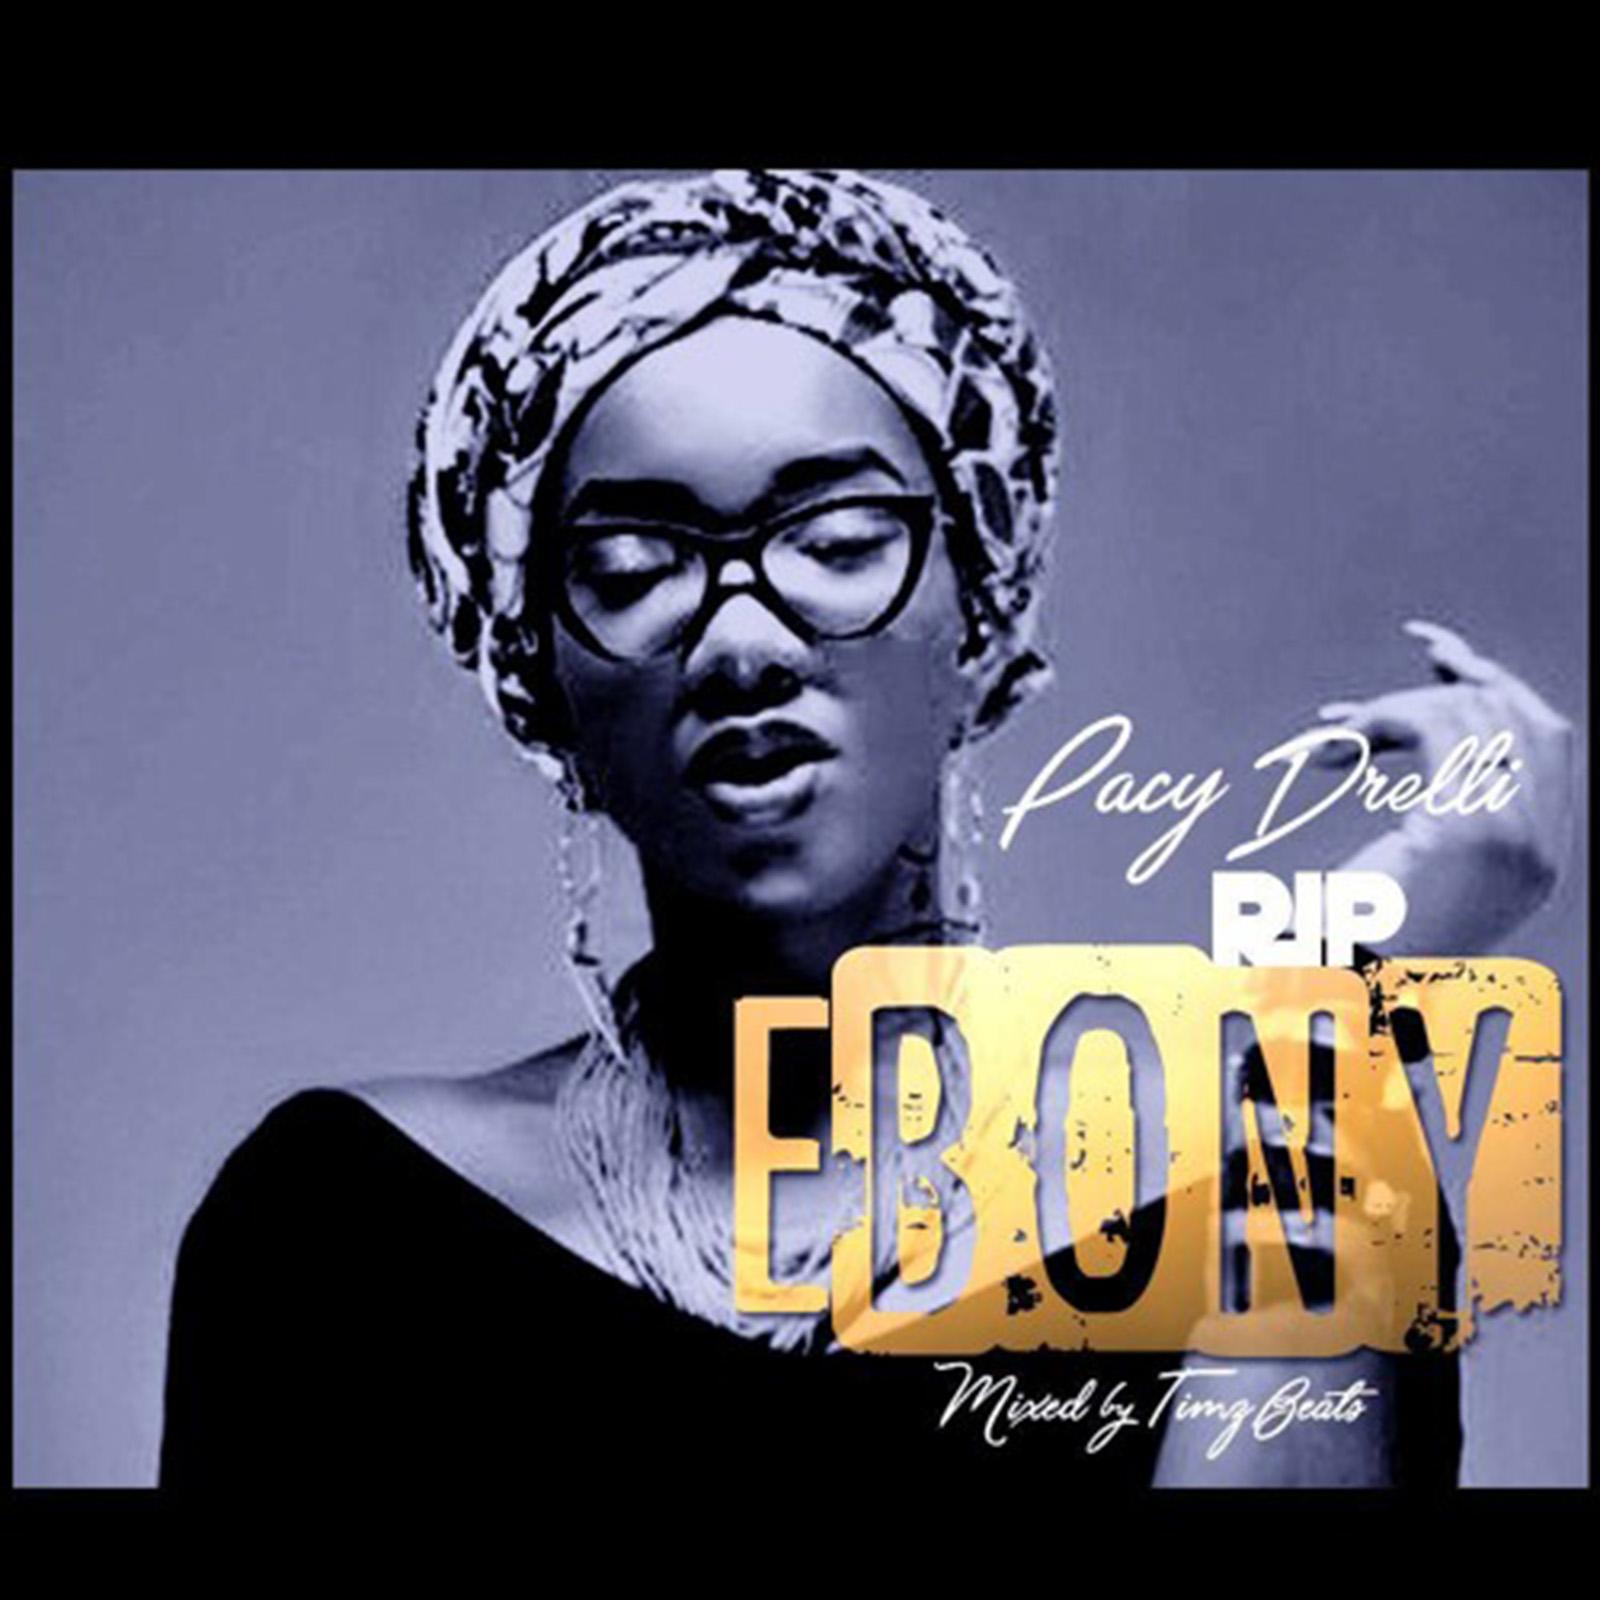 RIP Ebony by Pacy Drelli